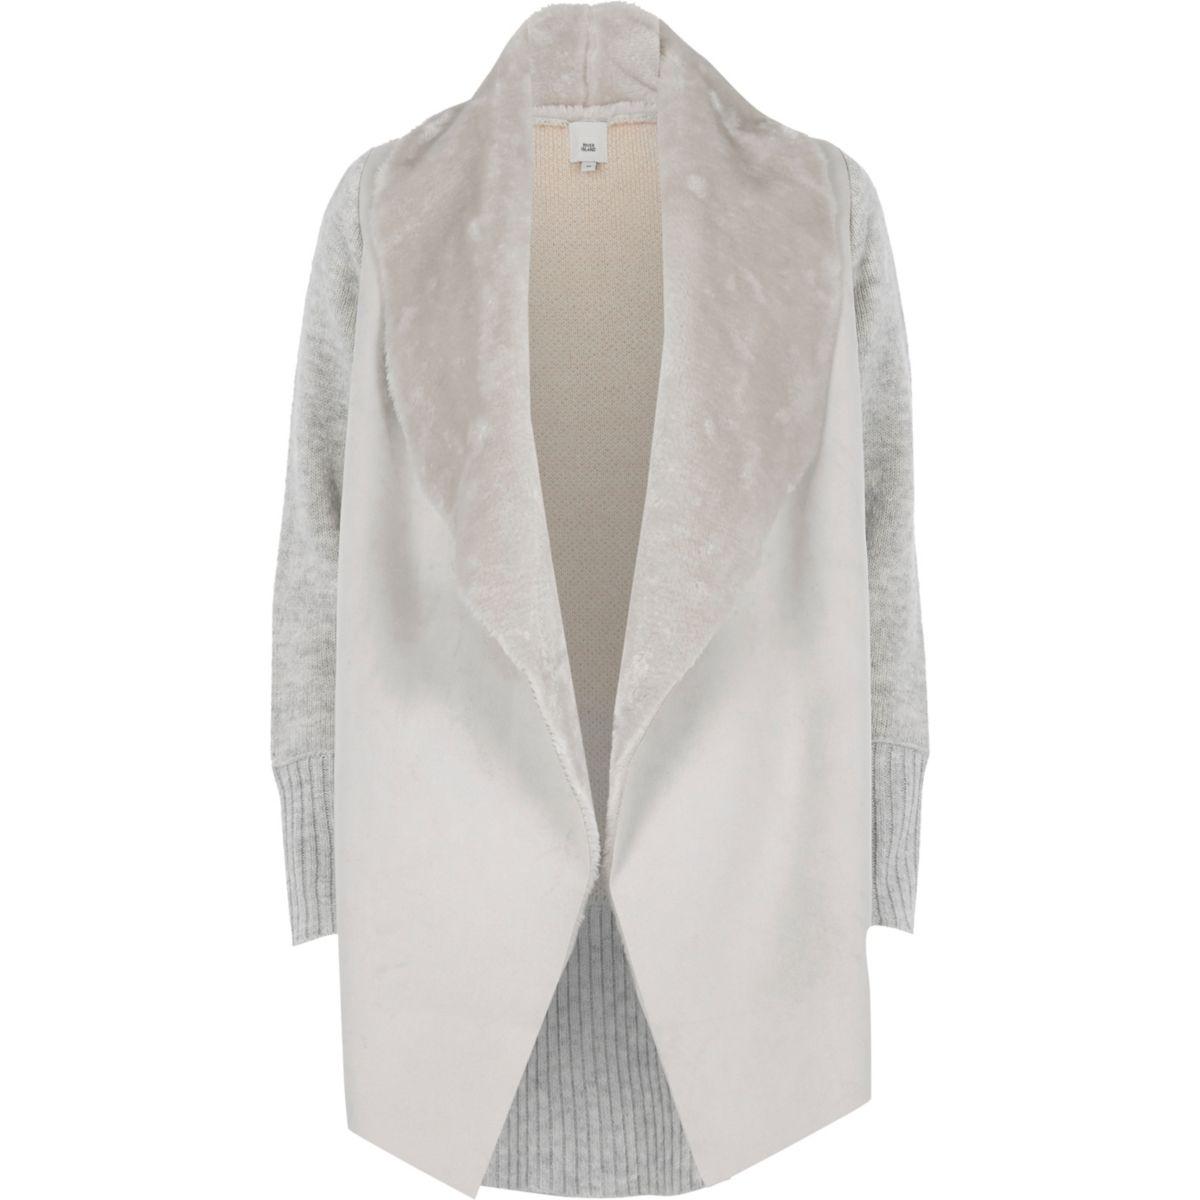 Light grey faux shearling fallaway cardigan